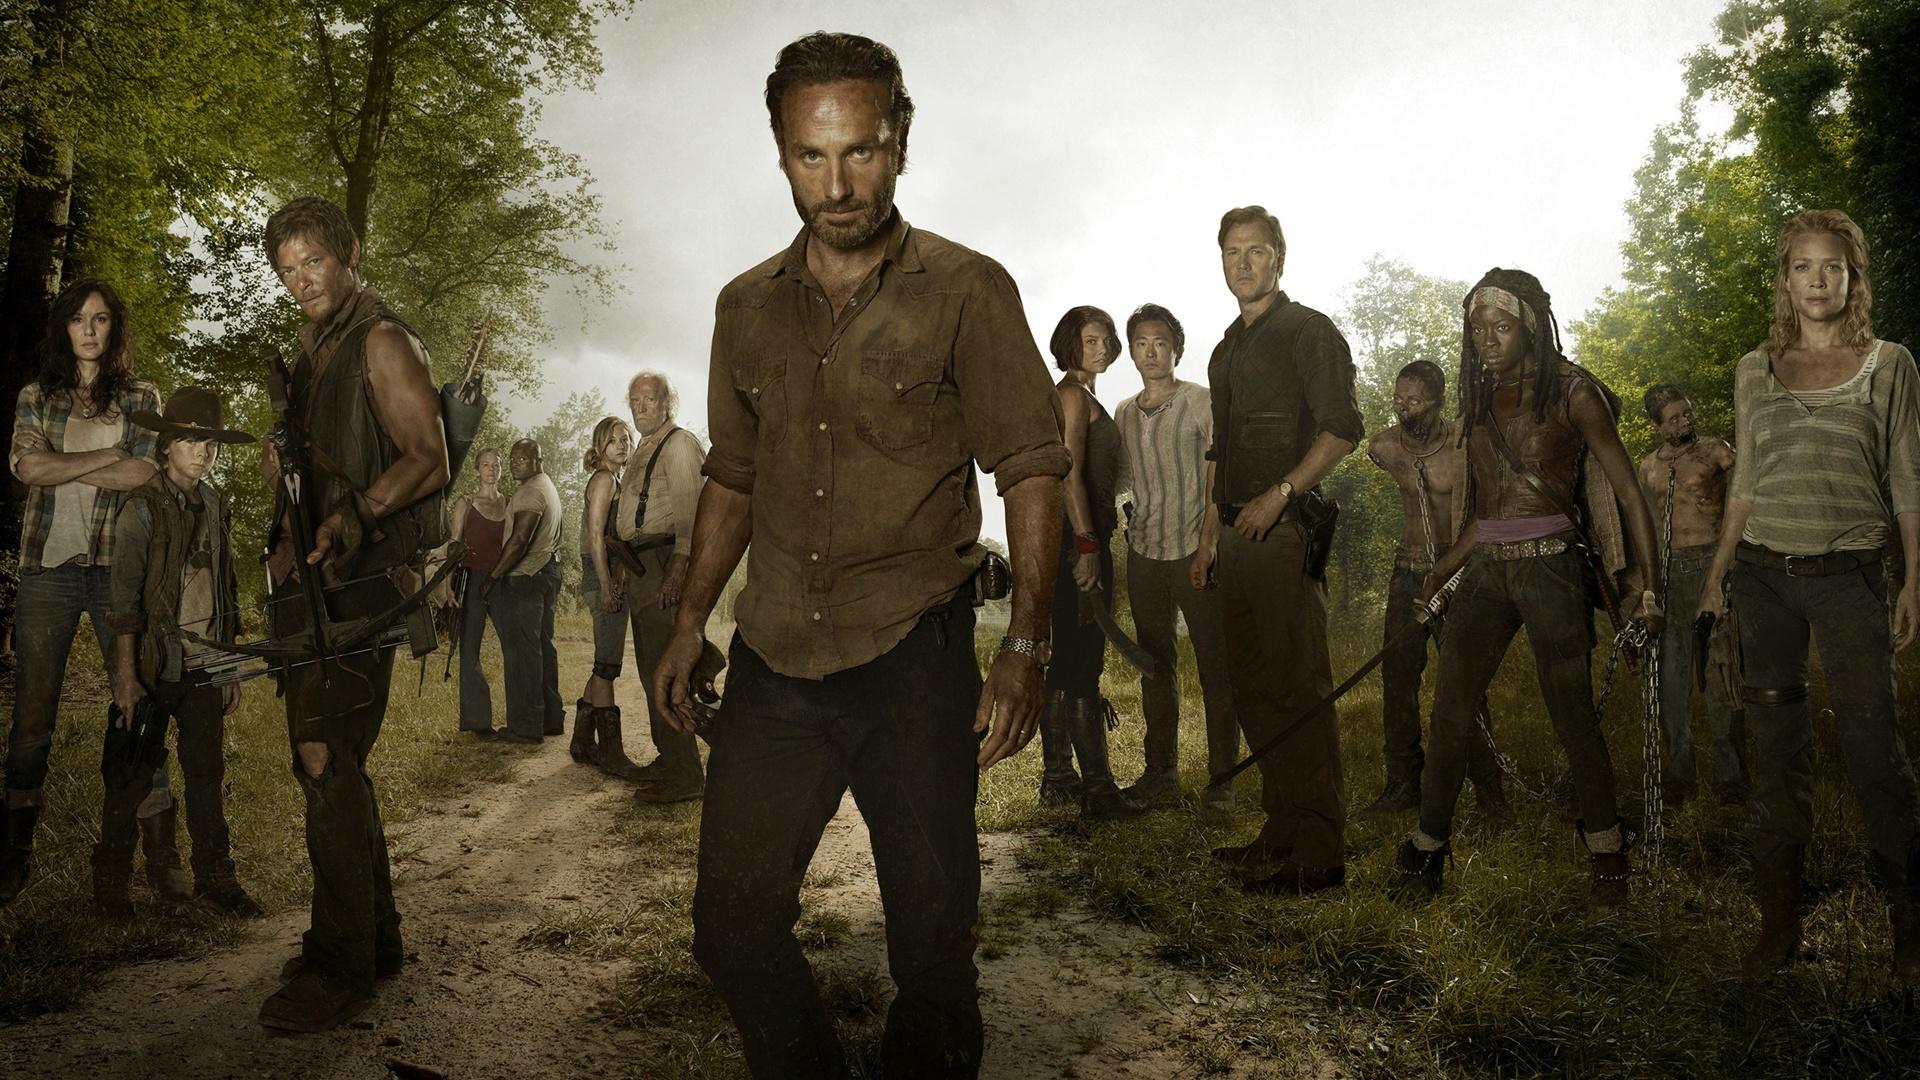 The Walking Dead Full Hd Fondo De Pantalla And Fondo De: The Walking Dead HD Fondos De Pantalla